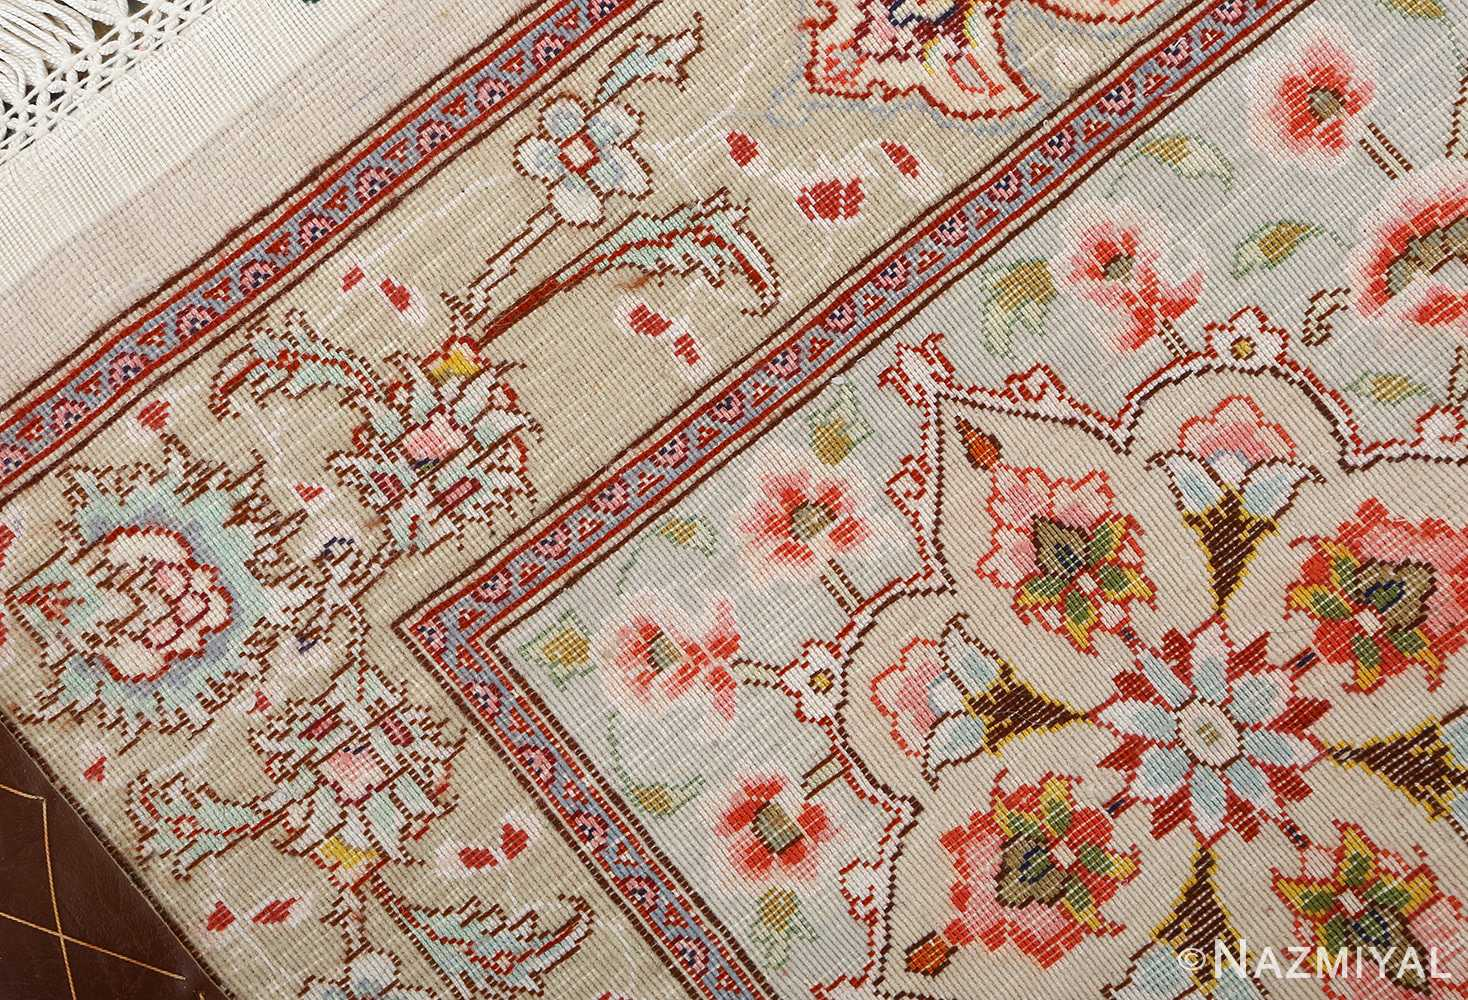 square shahsavarpour design vintage tabriz persian rug 51076 weave Nazmiyal